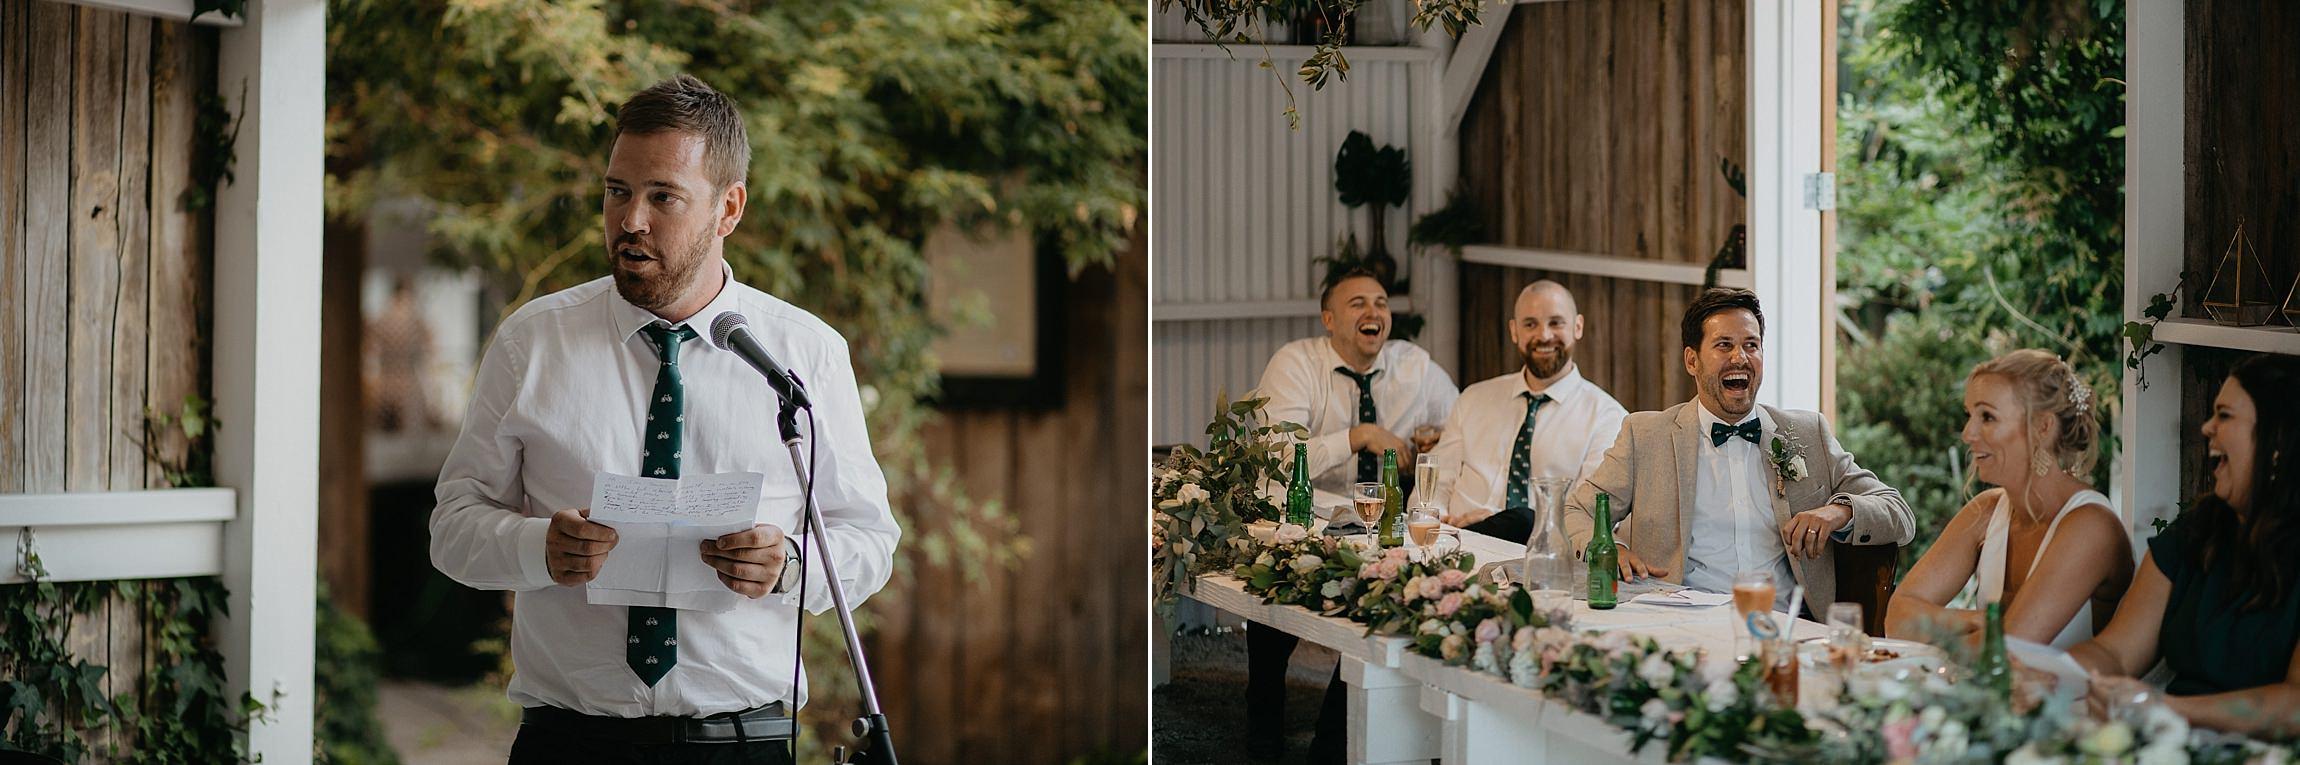 oldforestschool-wedding-blog-176.jpg